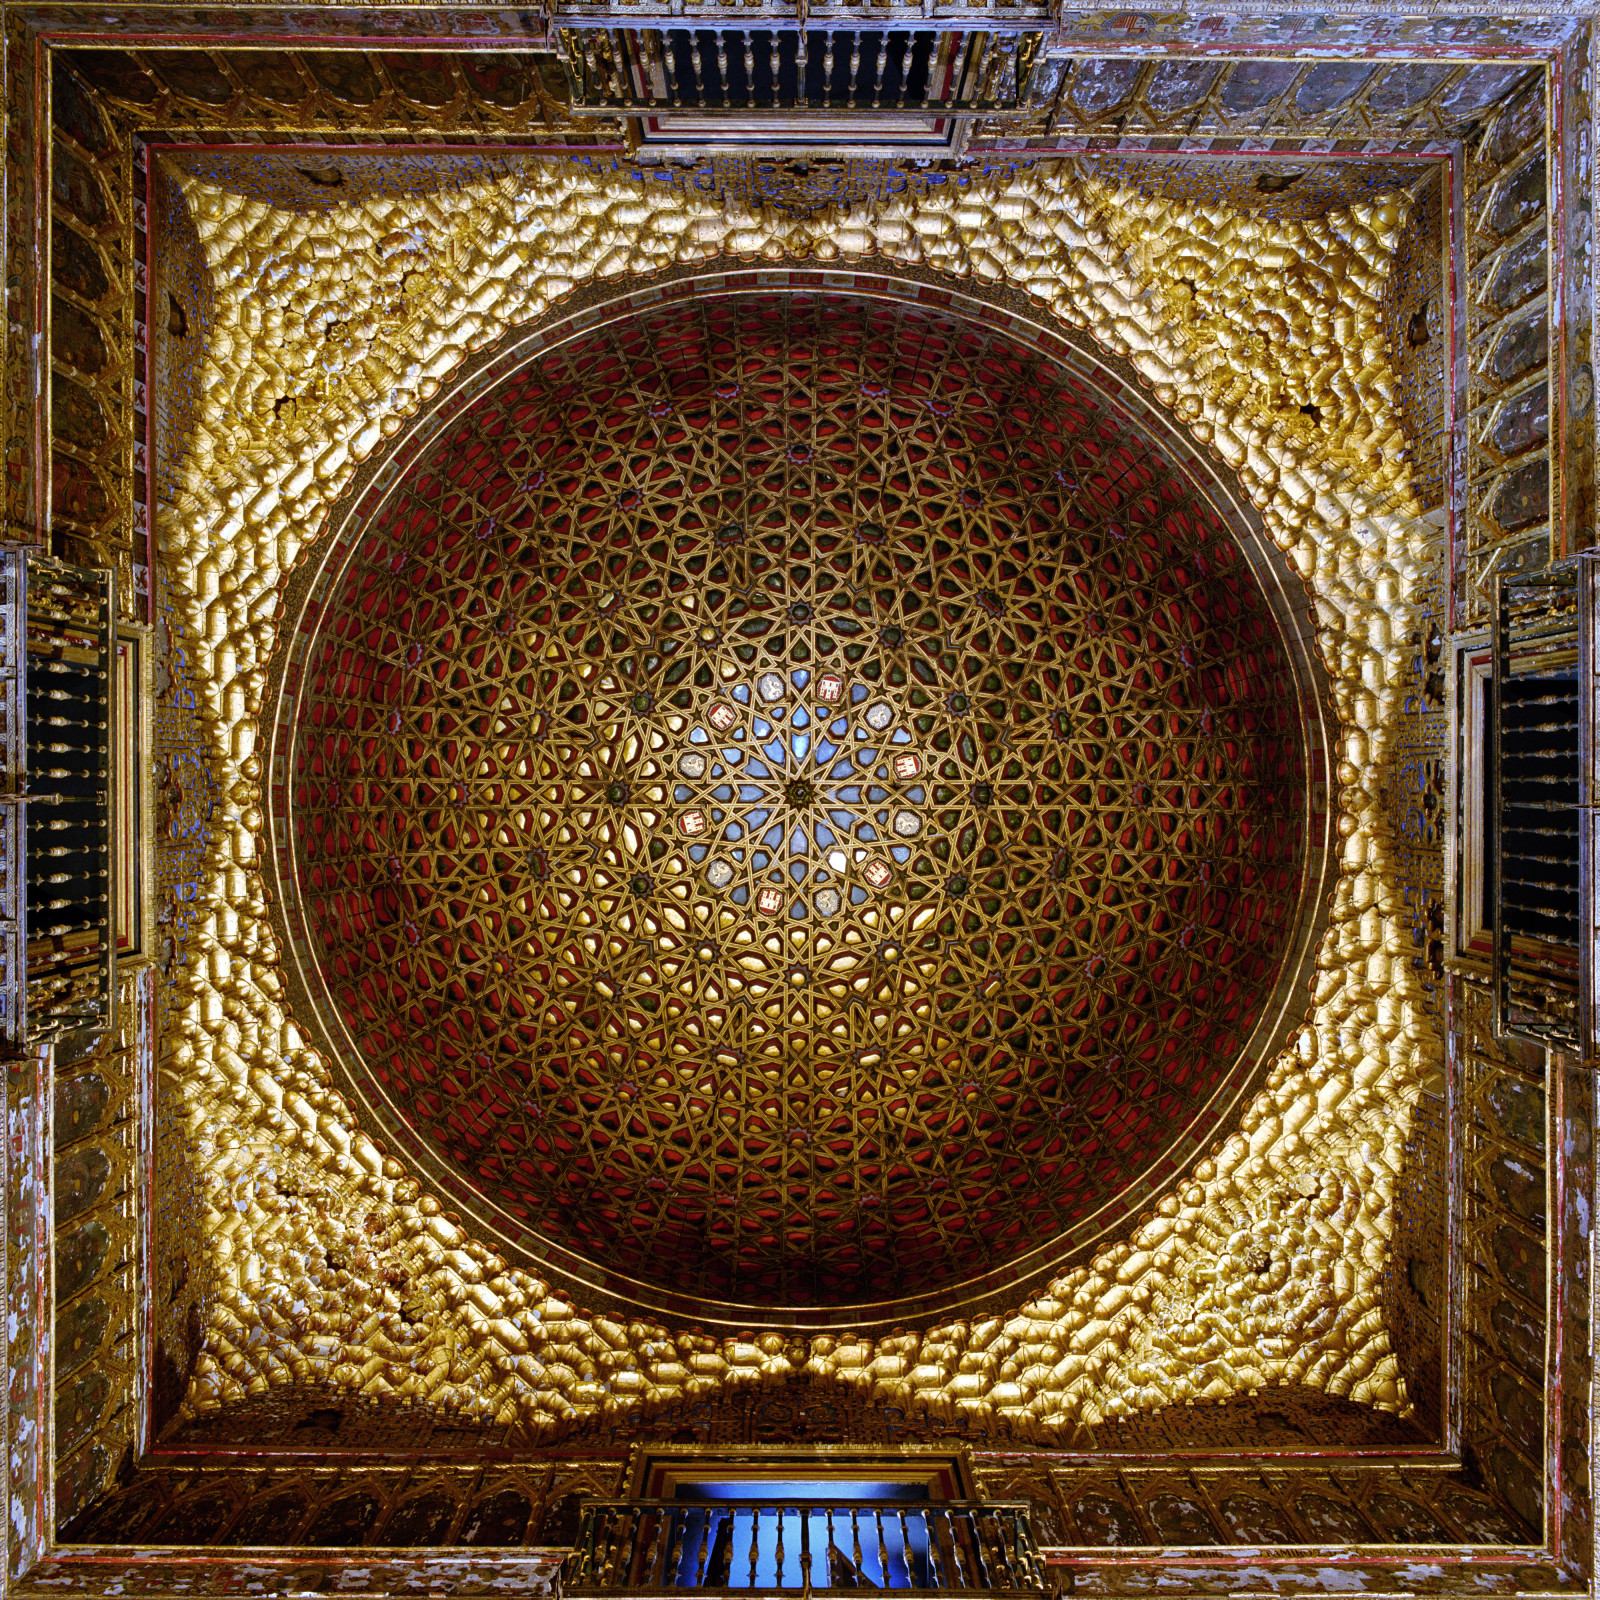 Dome #21704, Salon des Embajudores, Alcazar, Seville, Spain , 1997